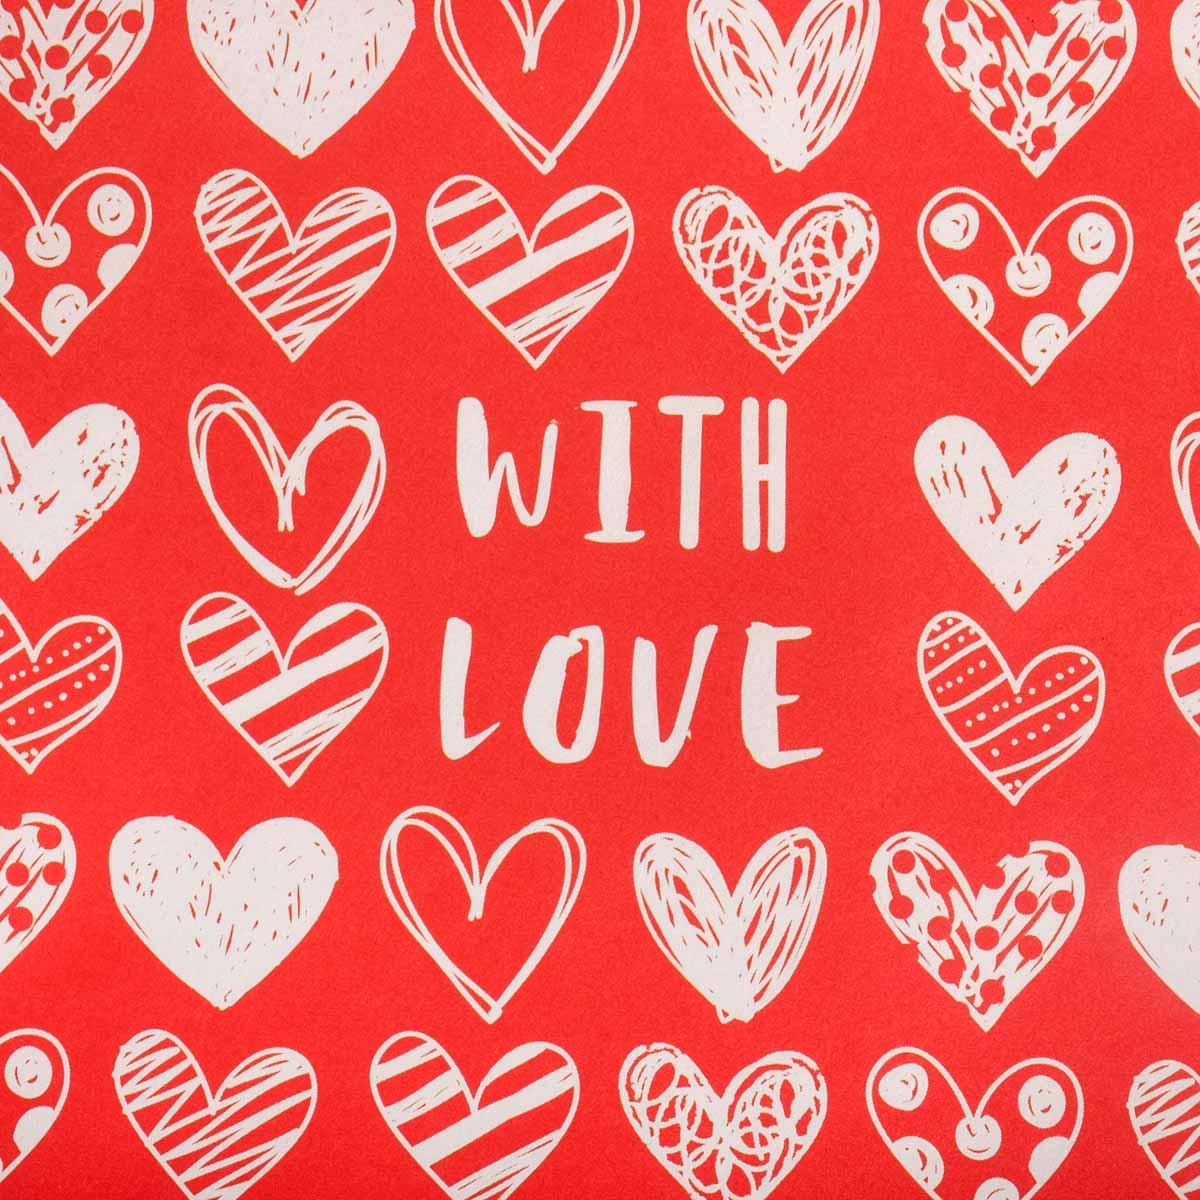 4580540 Бумага упаковочная крафтовая With love, фон красный, 50*70 см